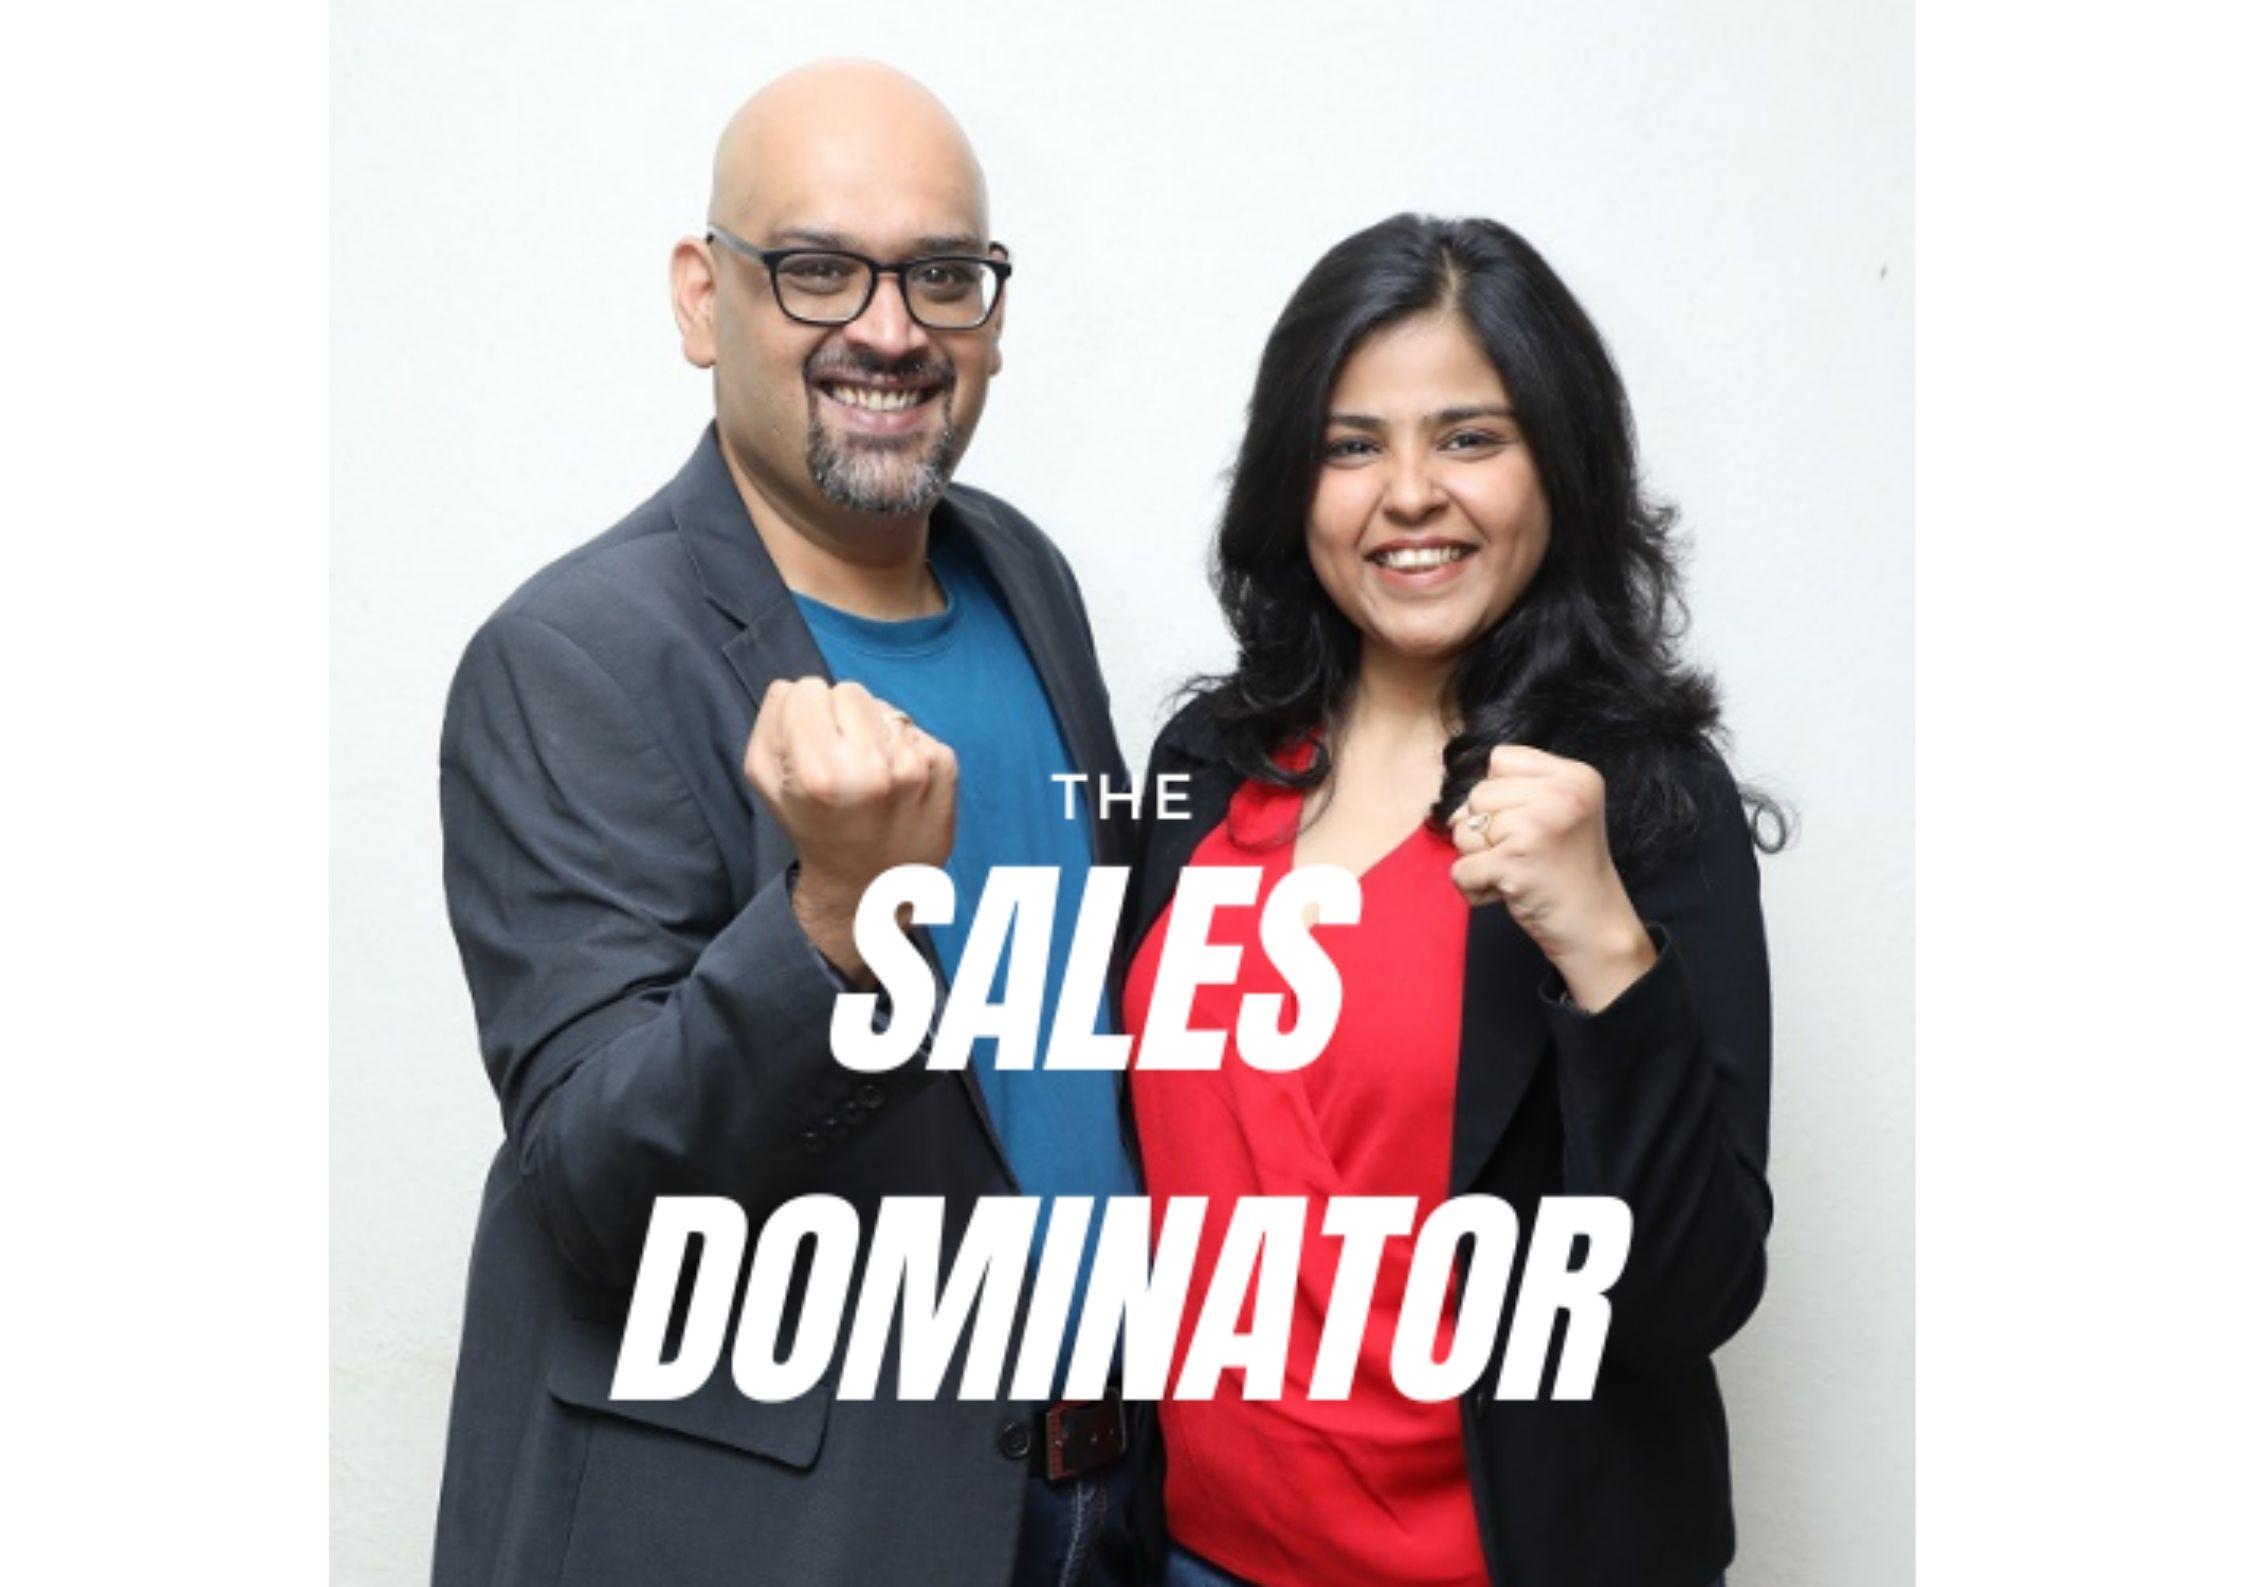 logo of the sales dominator